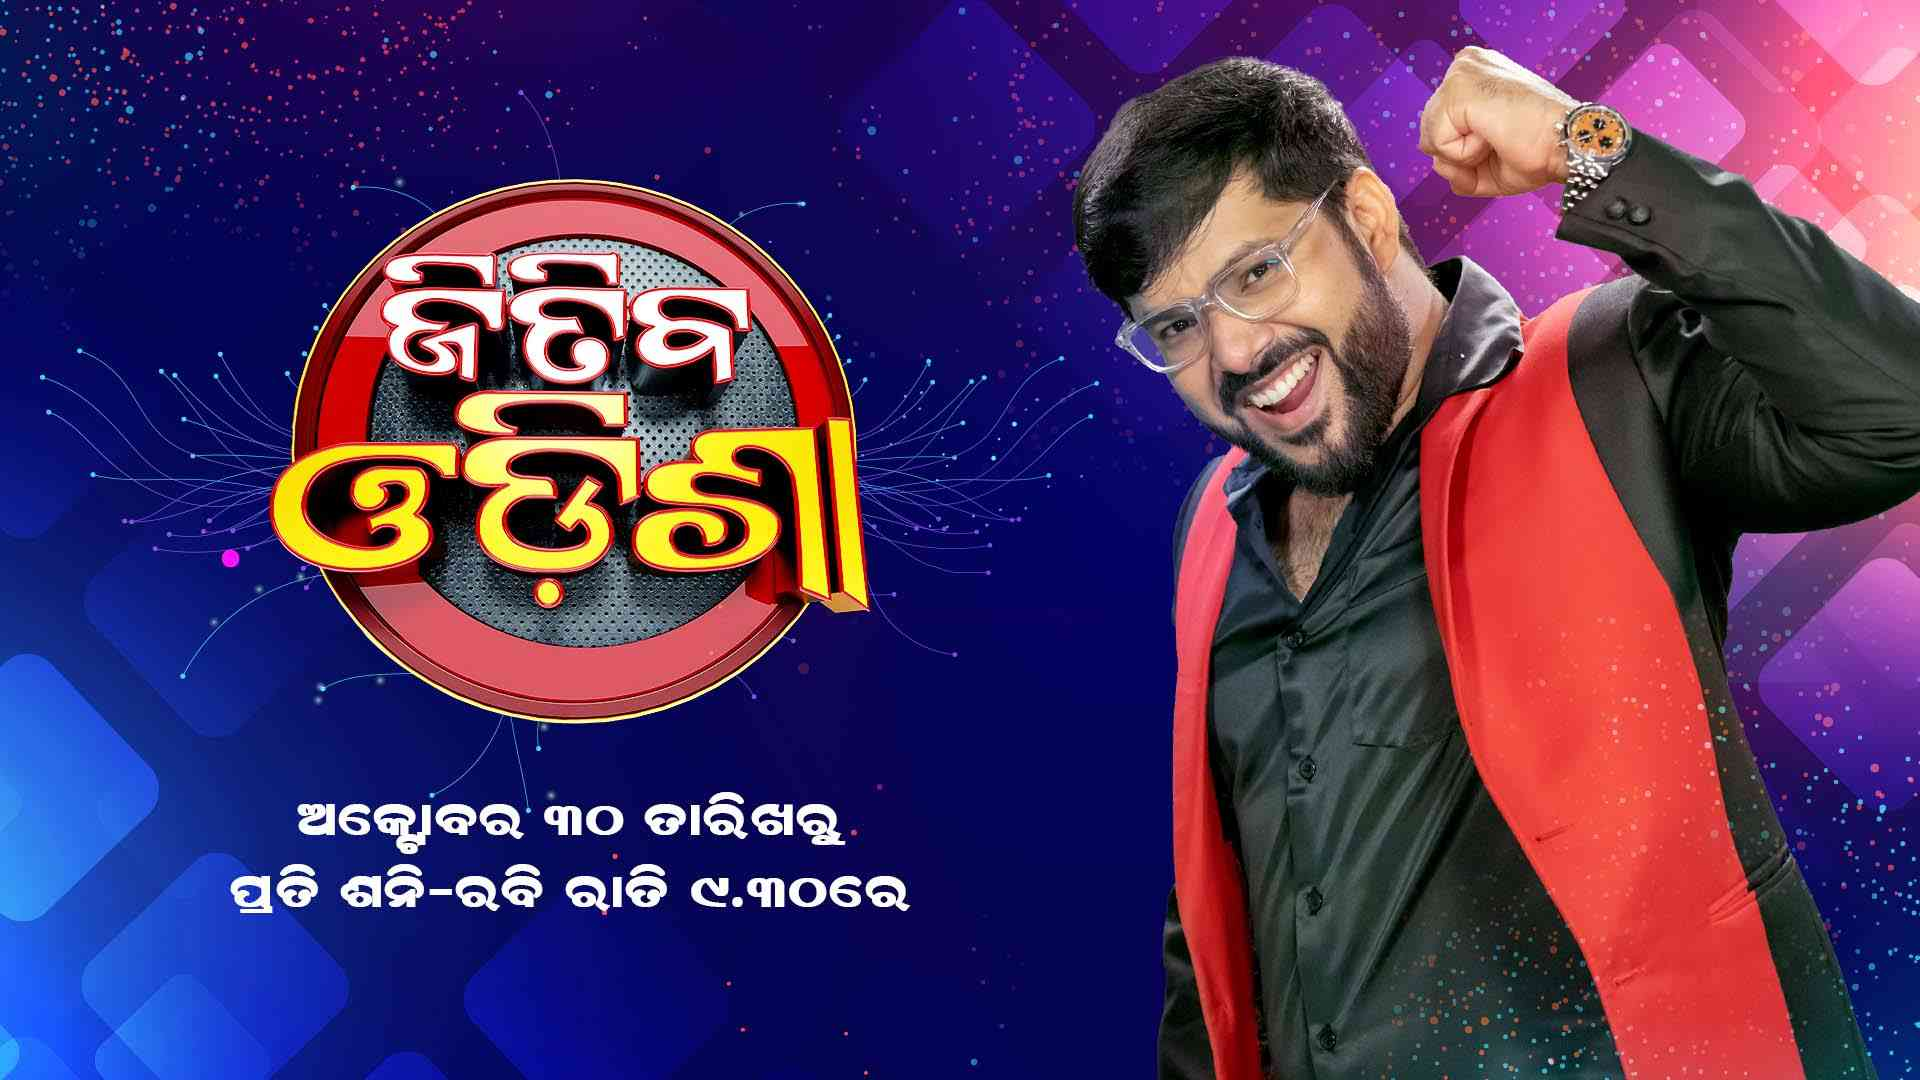 Jitiba Odisha